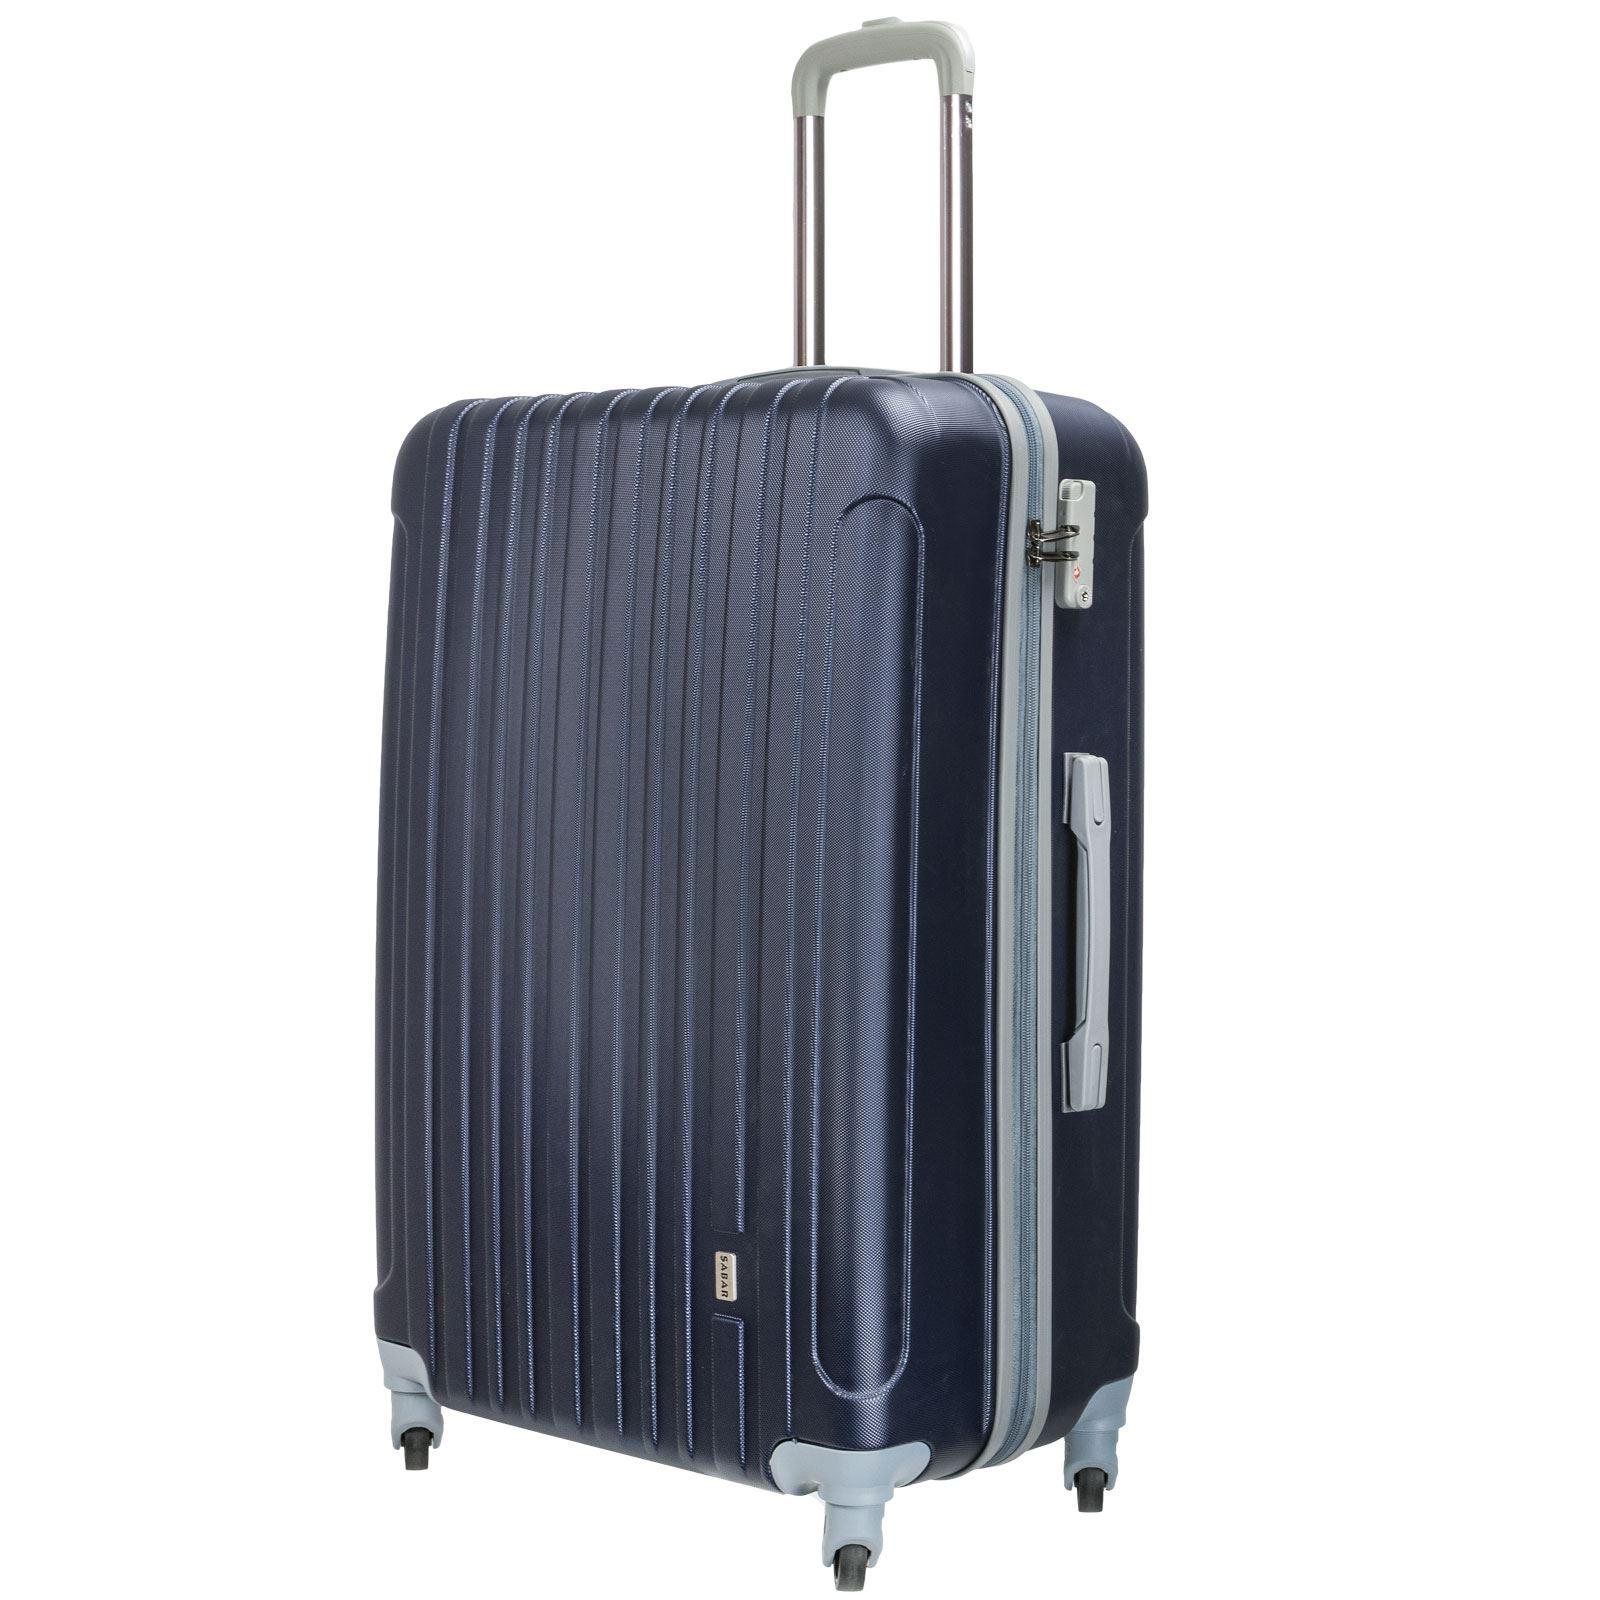 Luggage Set Hard Stipe Trolley Suitcase Spinner Wheels